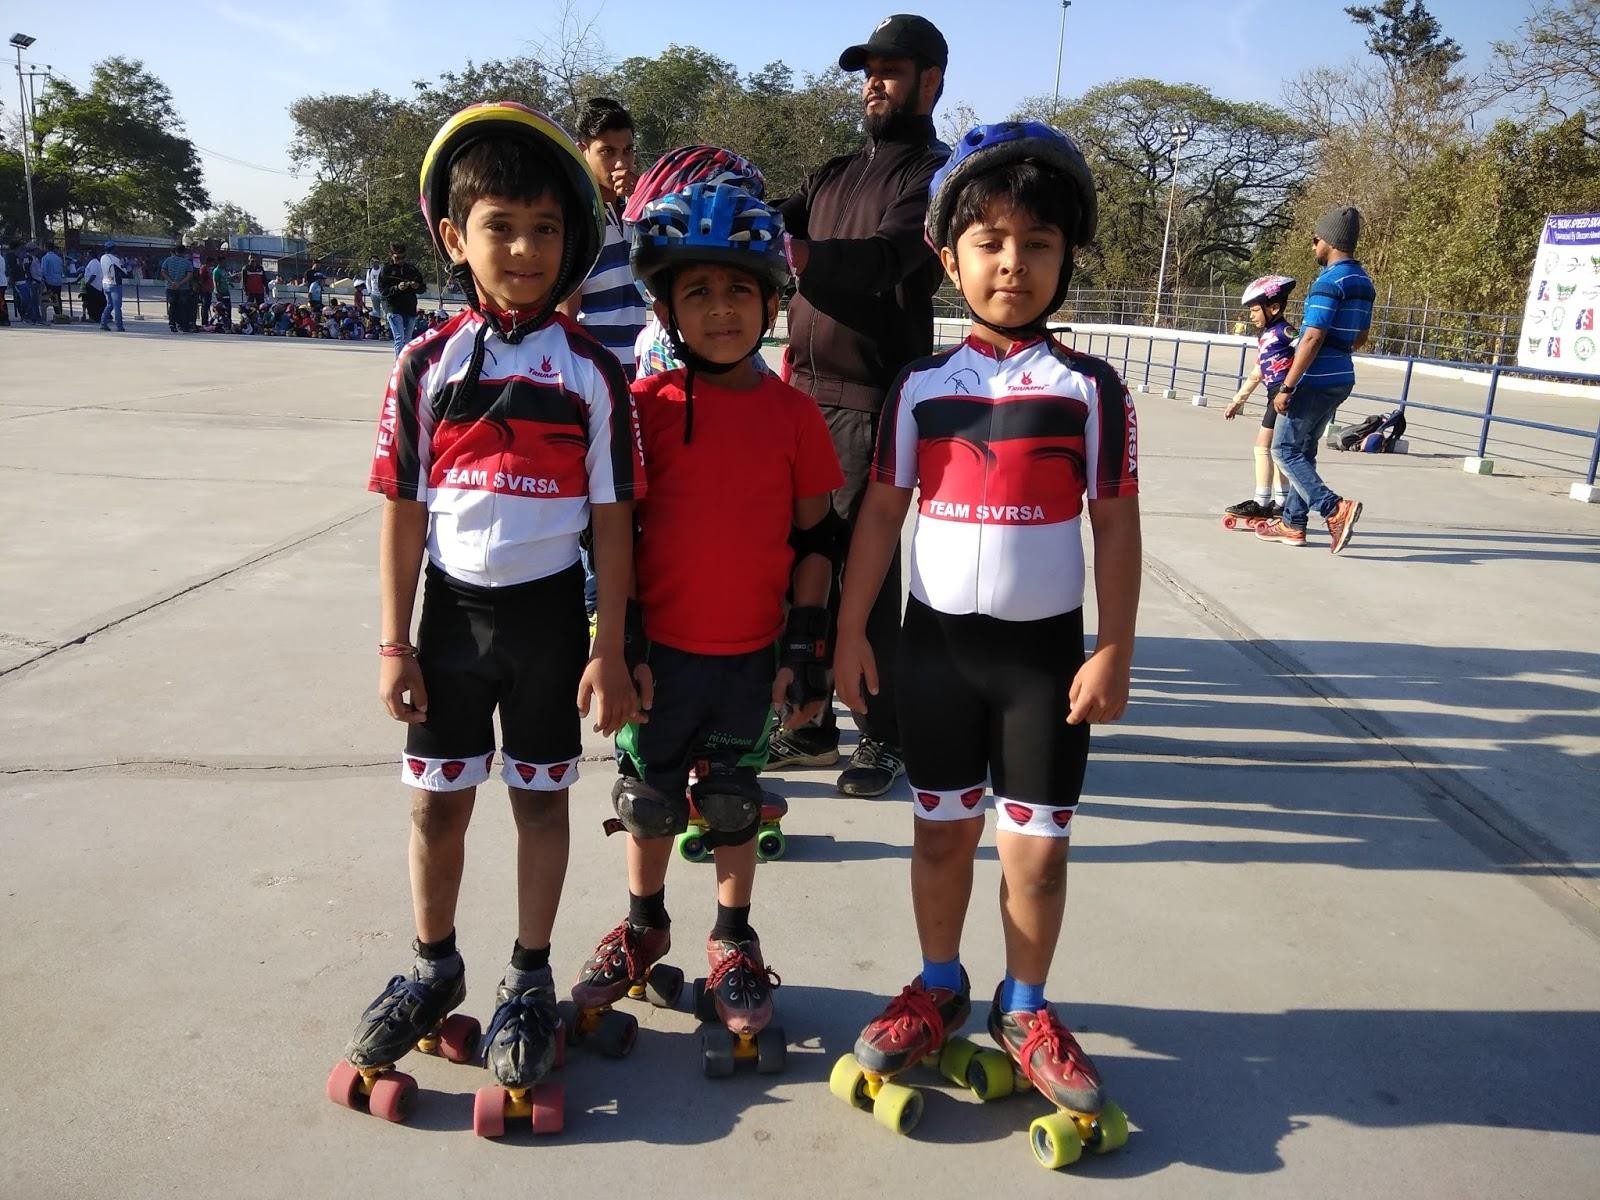 Roller shoes in hyderabad - Roller Skates In Hyderabad